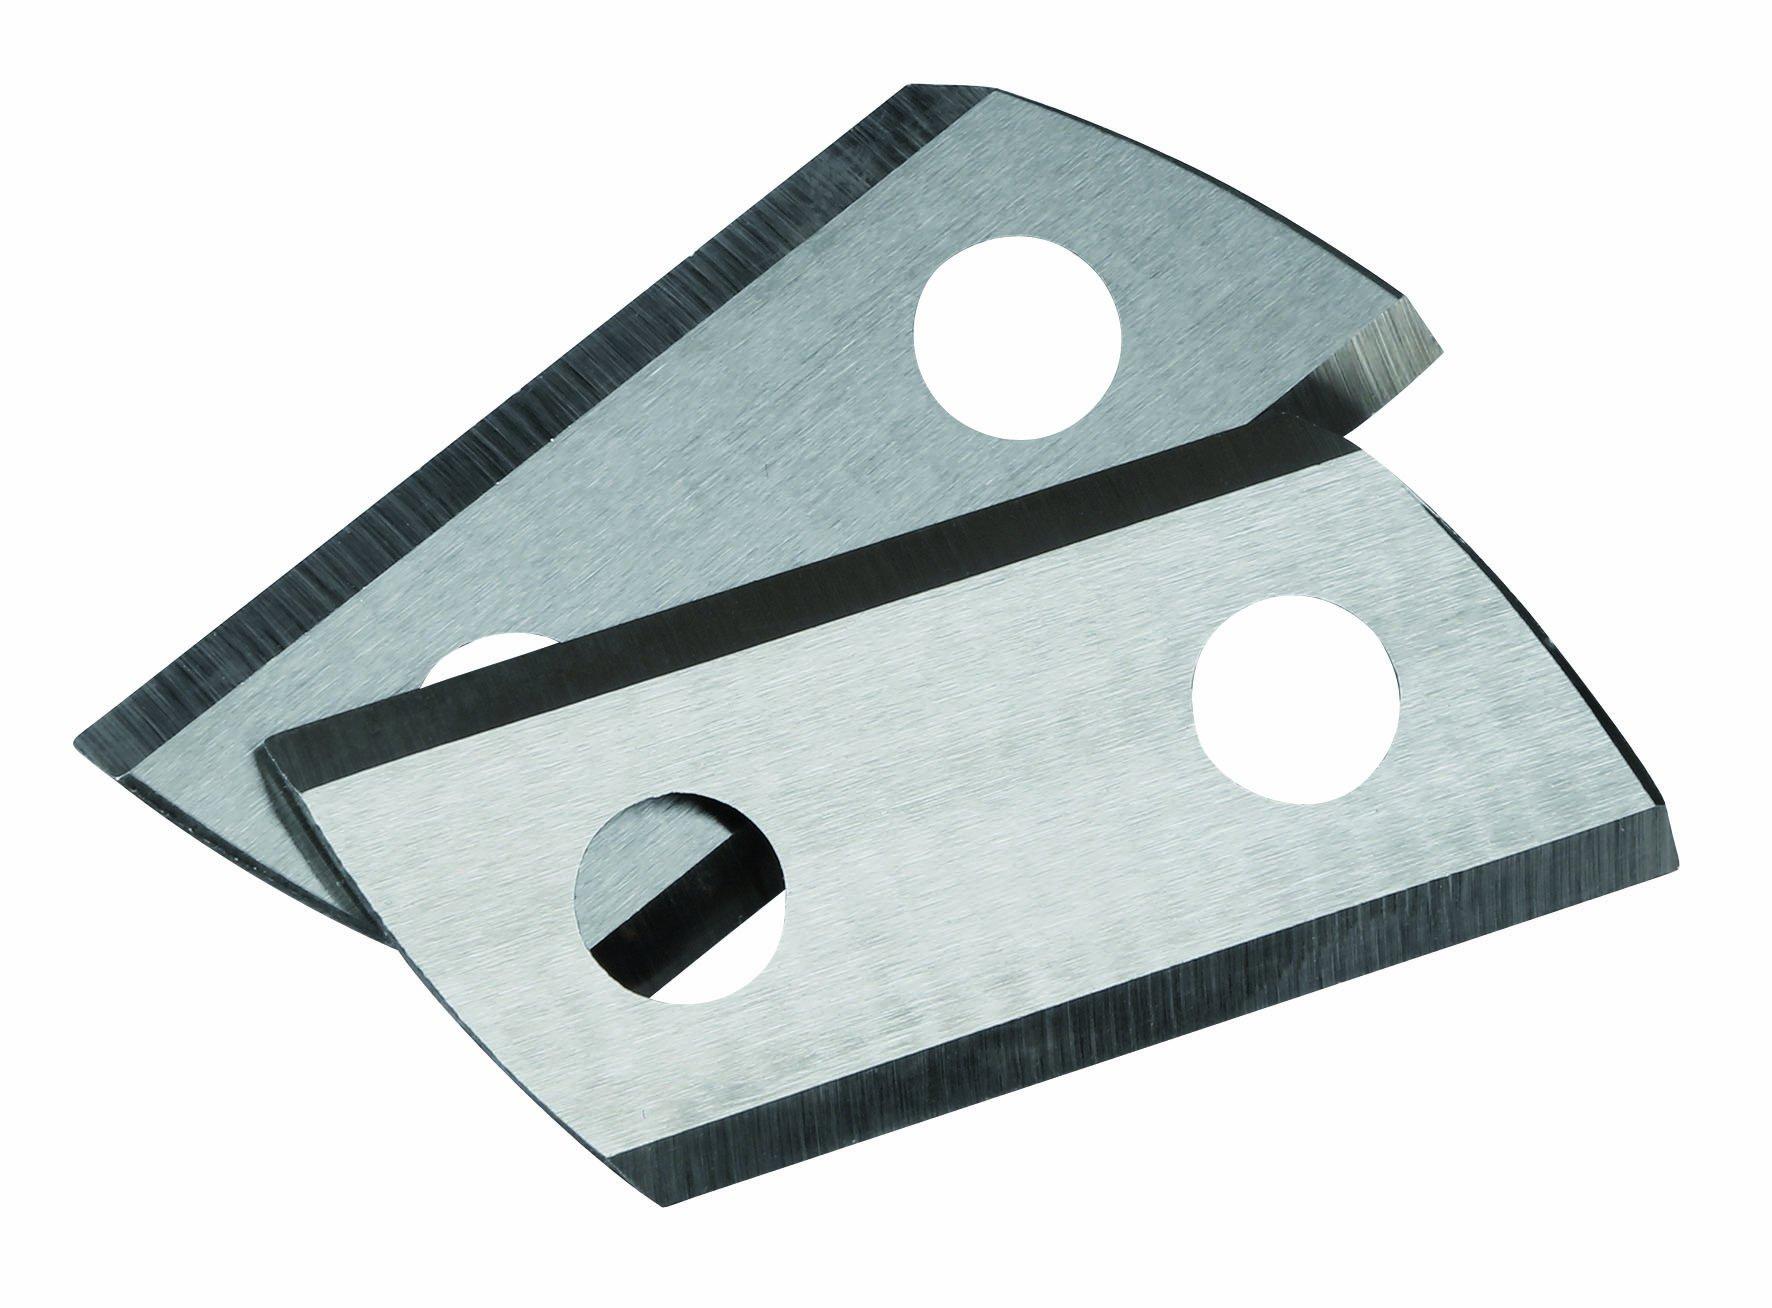 Einhell - Kit cuchillas para biotrituradora GH-KS 2440 product image